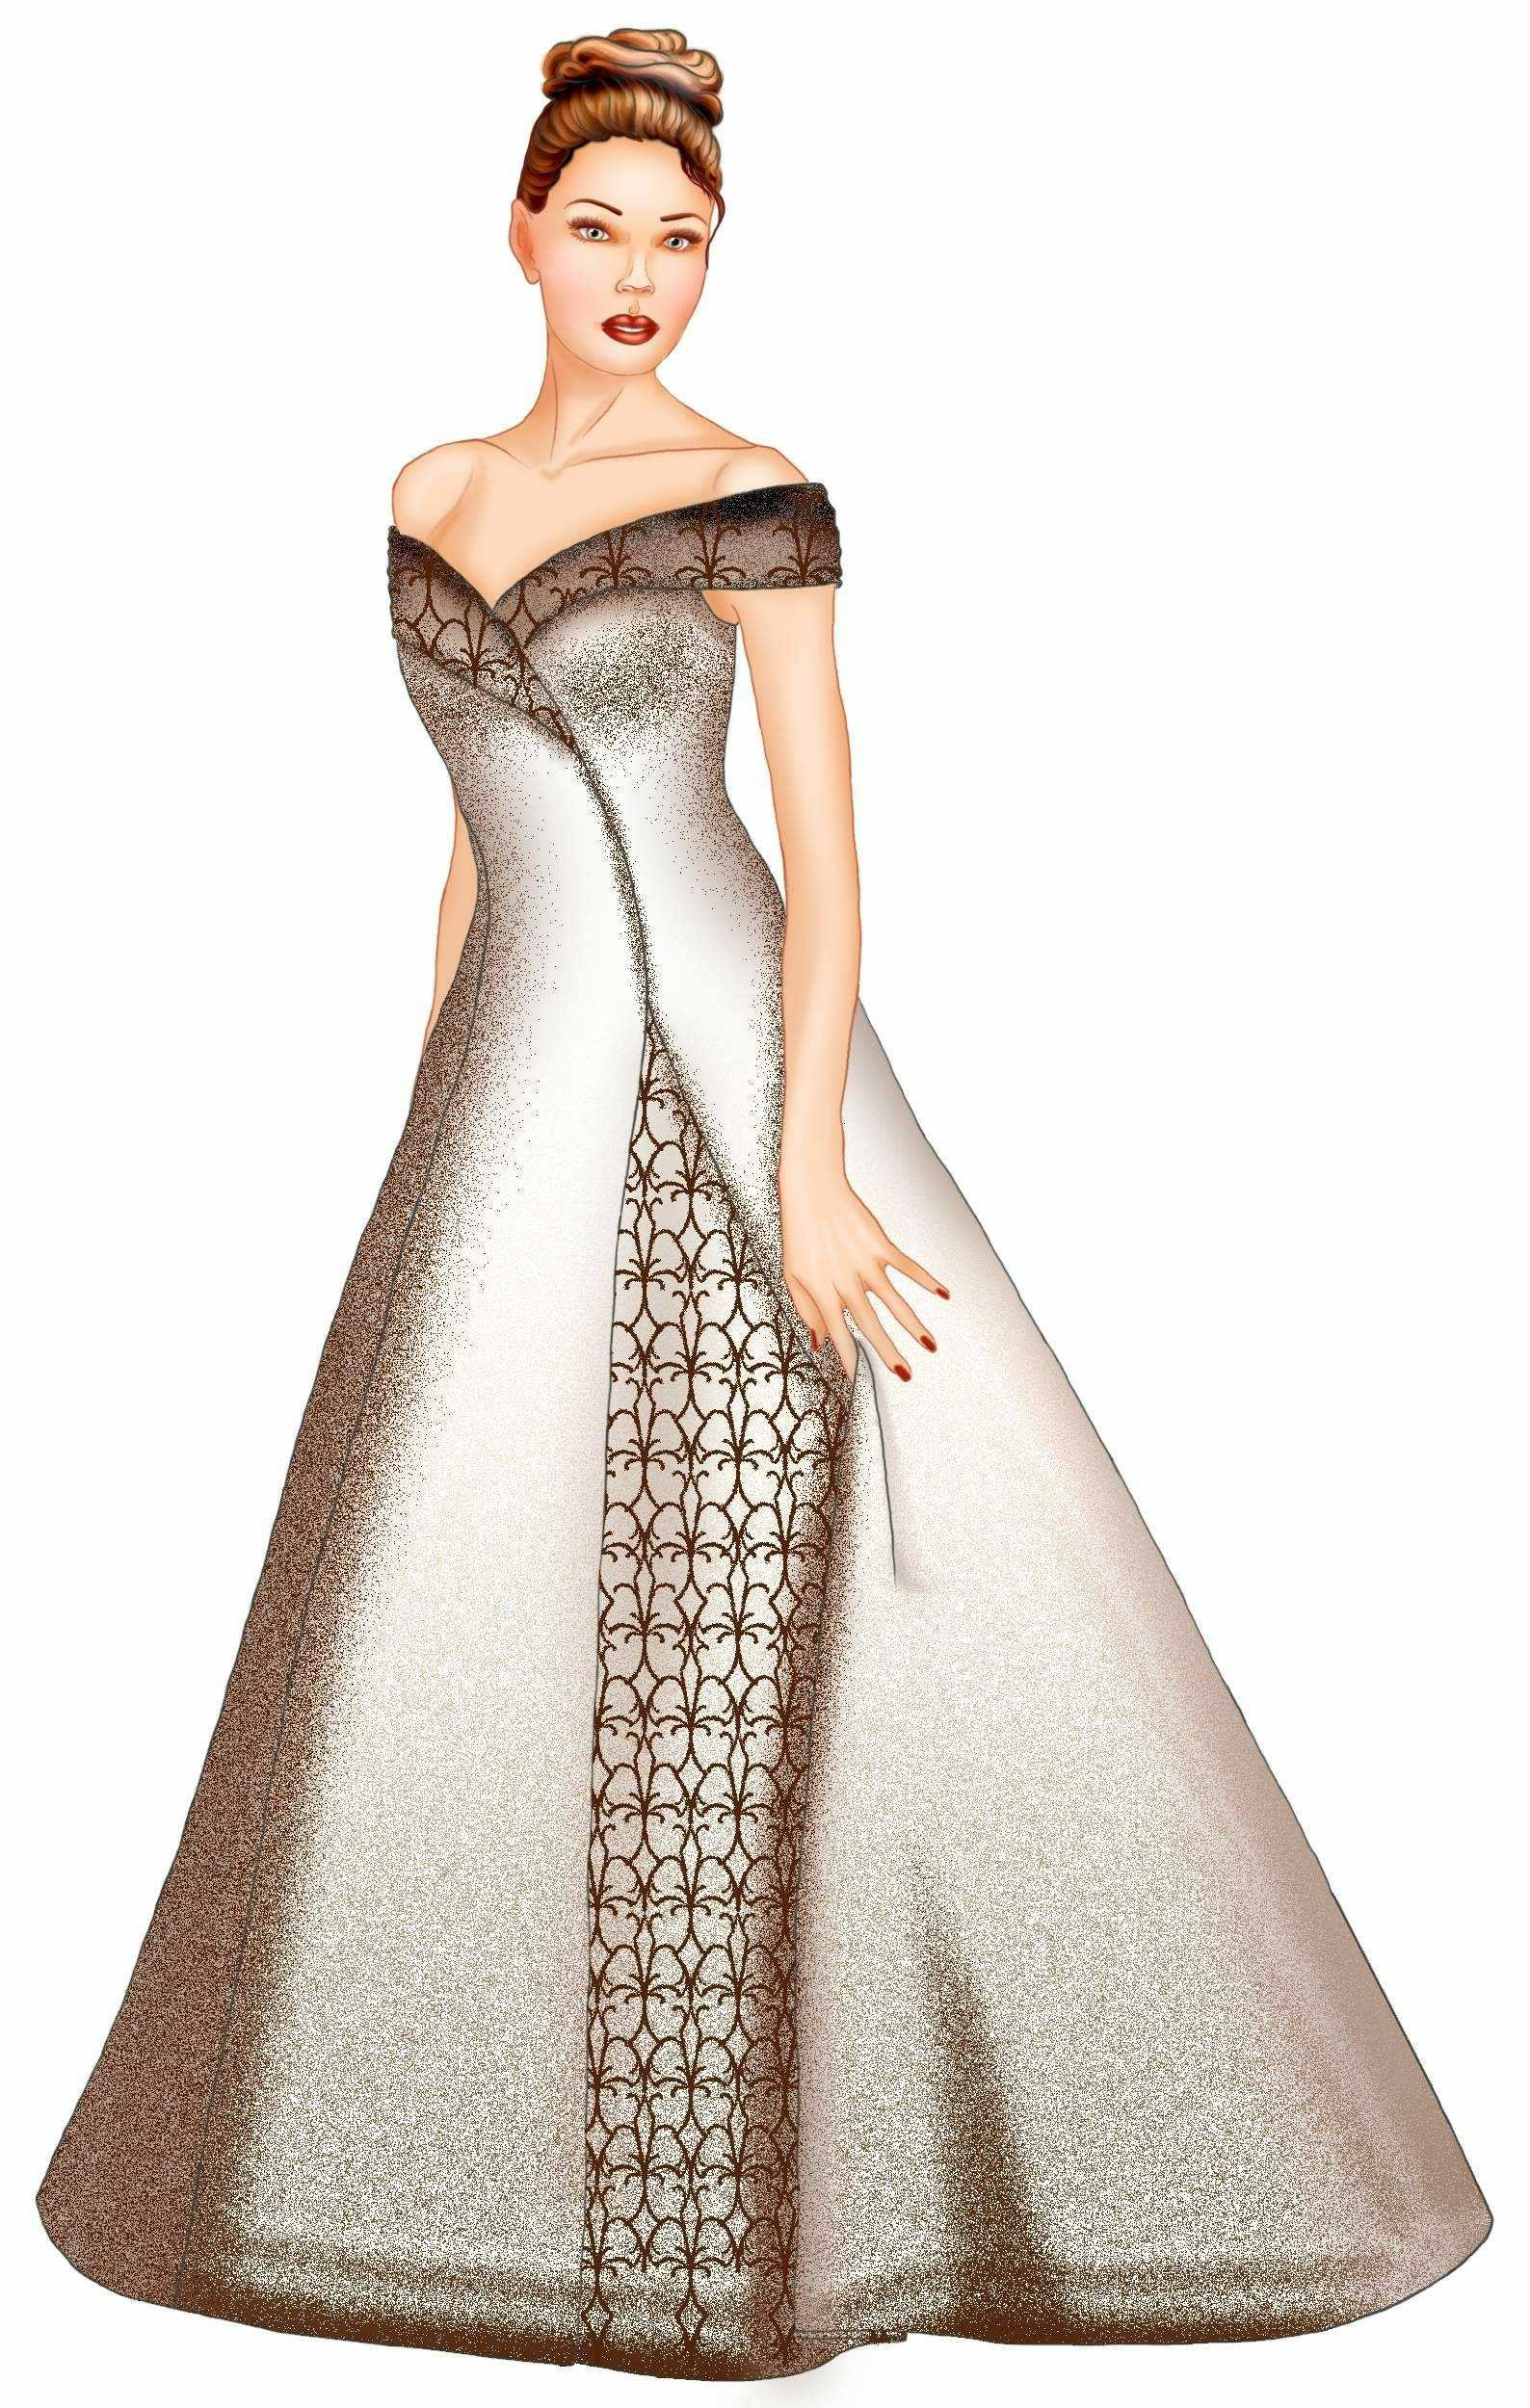 Wedding Dress Patterns Free Wedding Dress Sewing Pattern 5530 Made to Measure